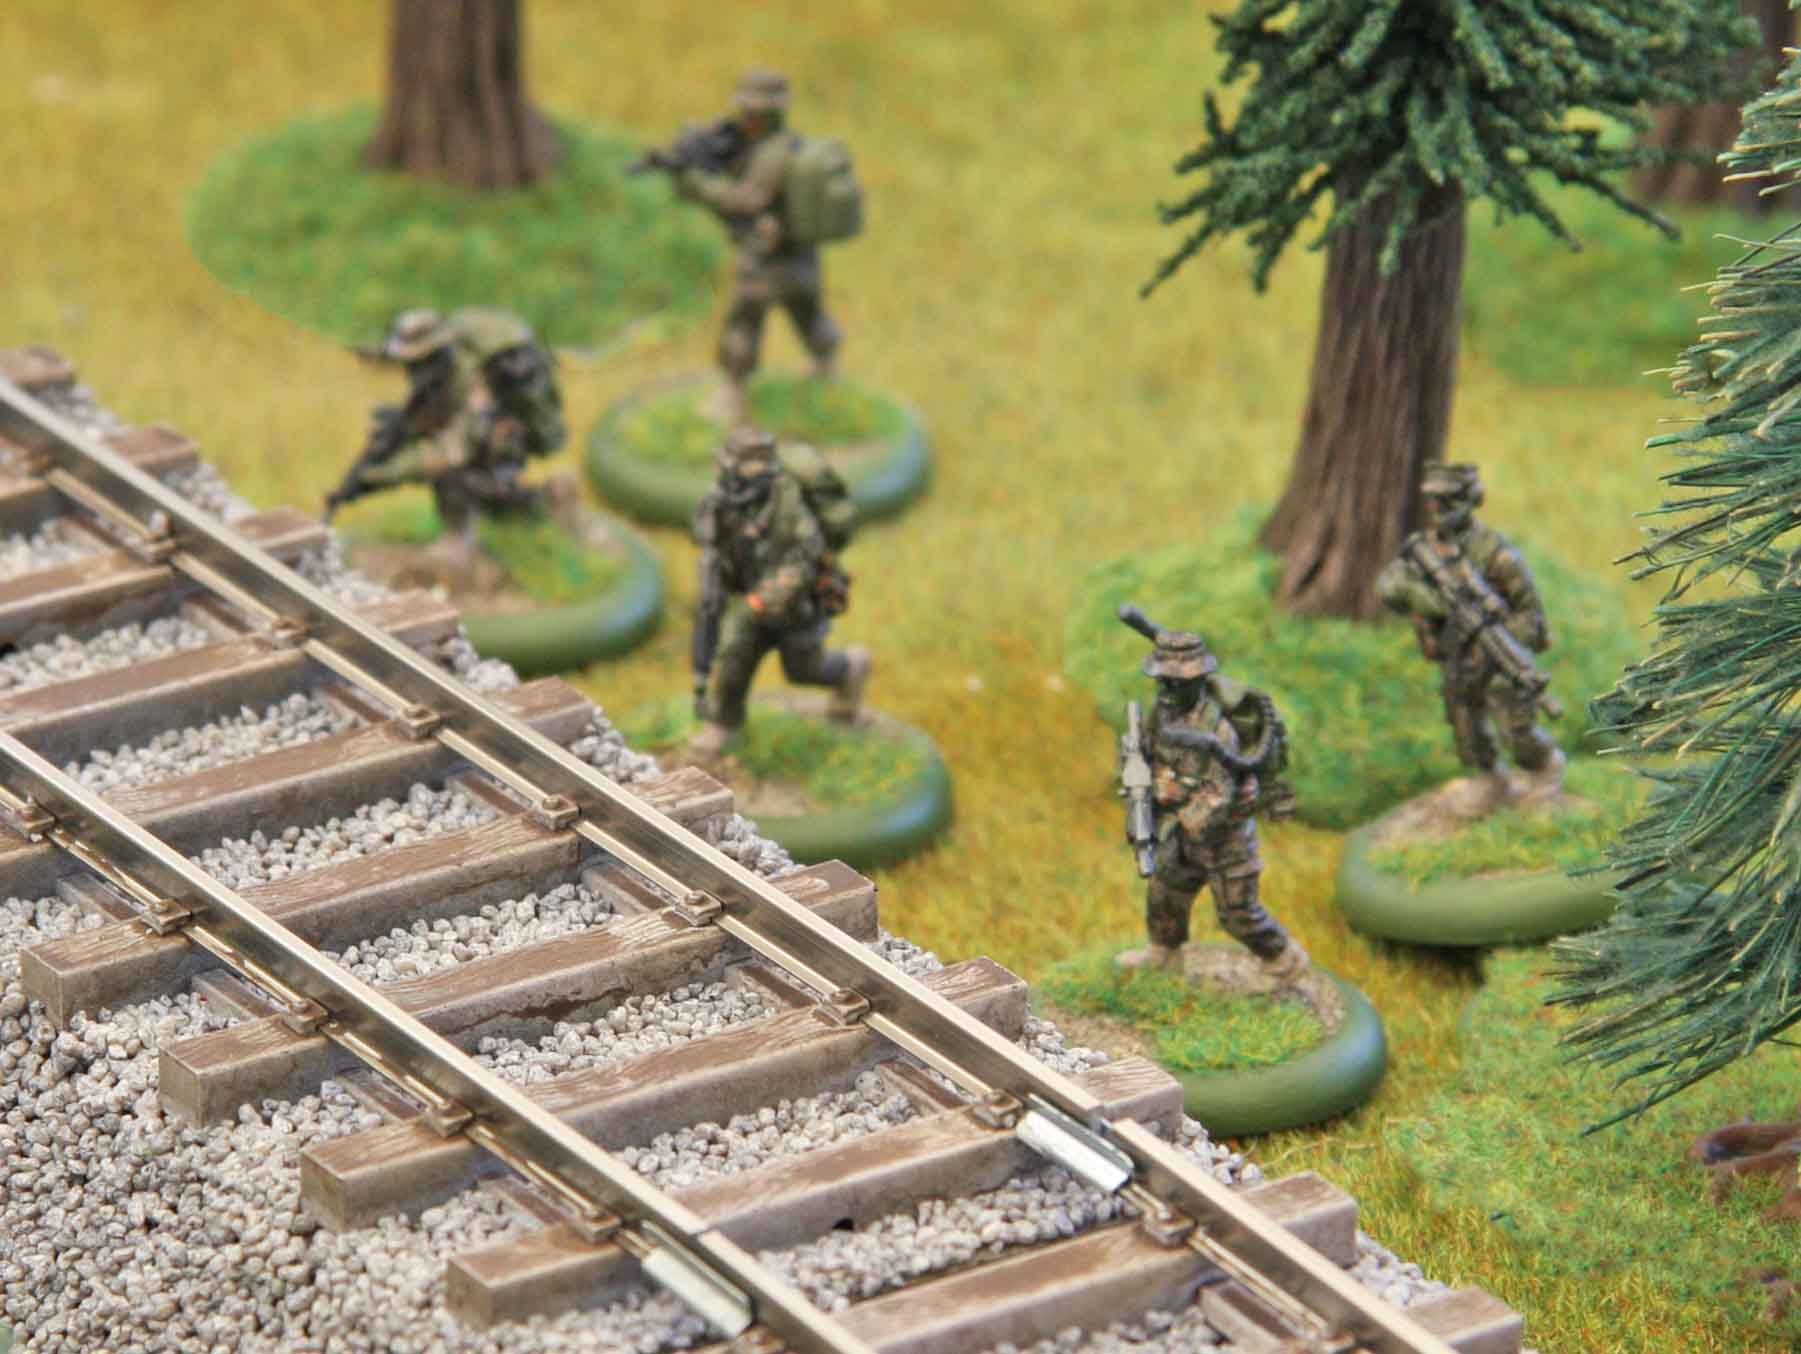 USMC advance on the right flank